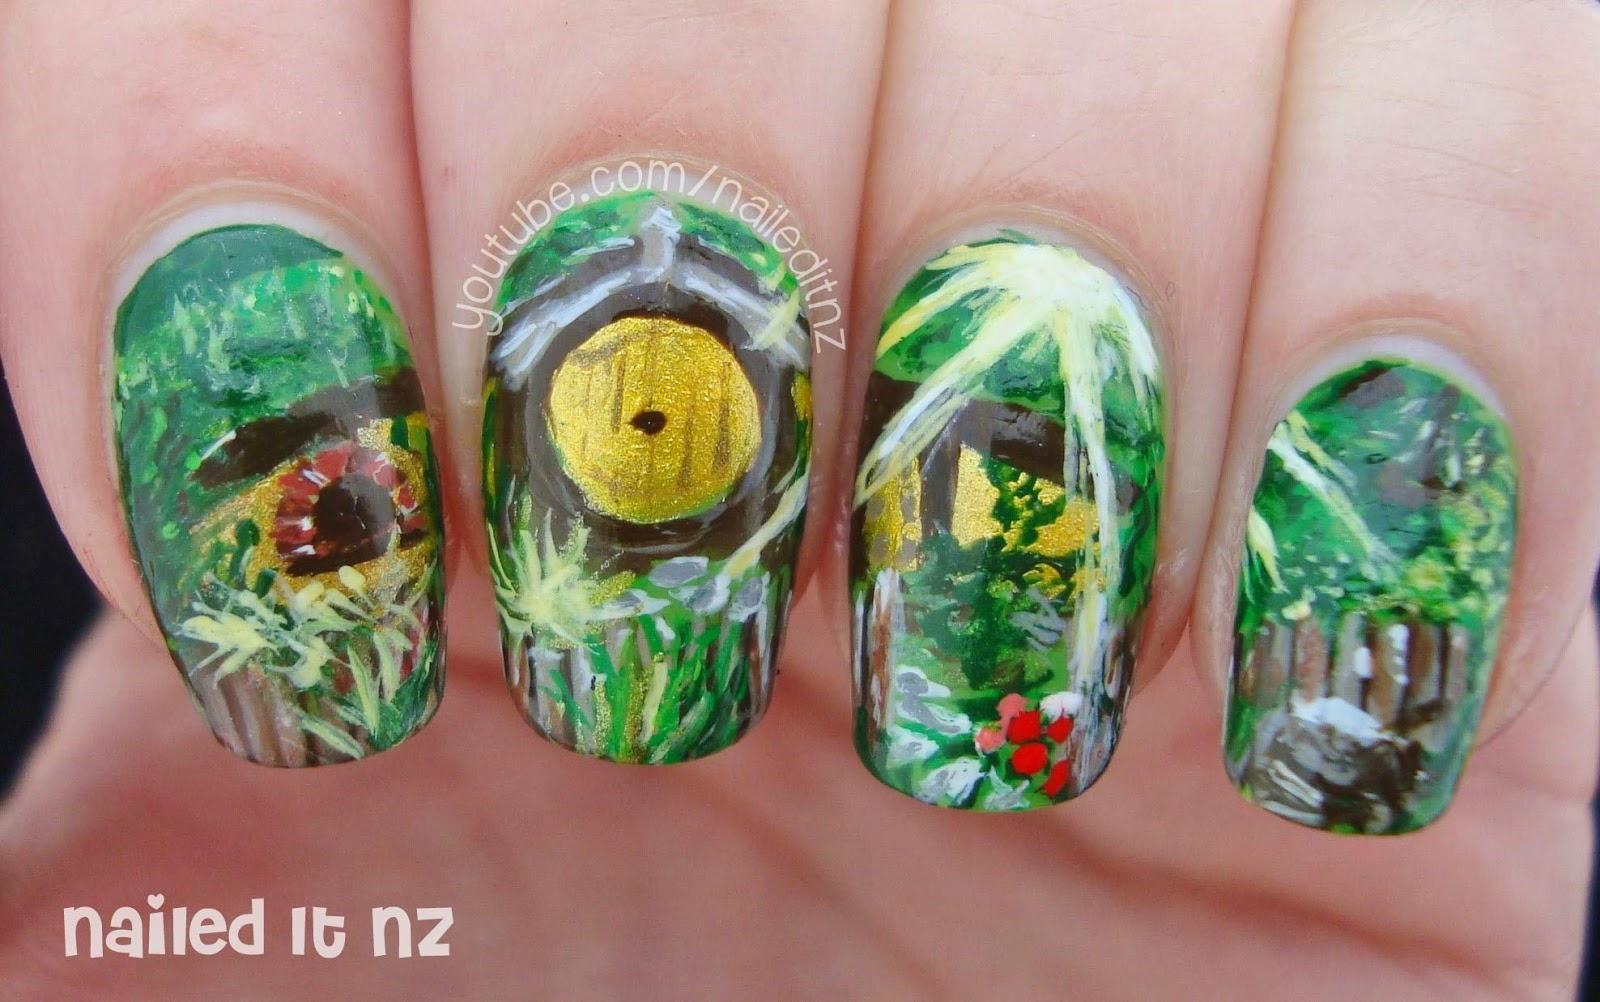 The Hobbit Nail Art | The Shire